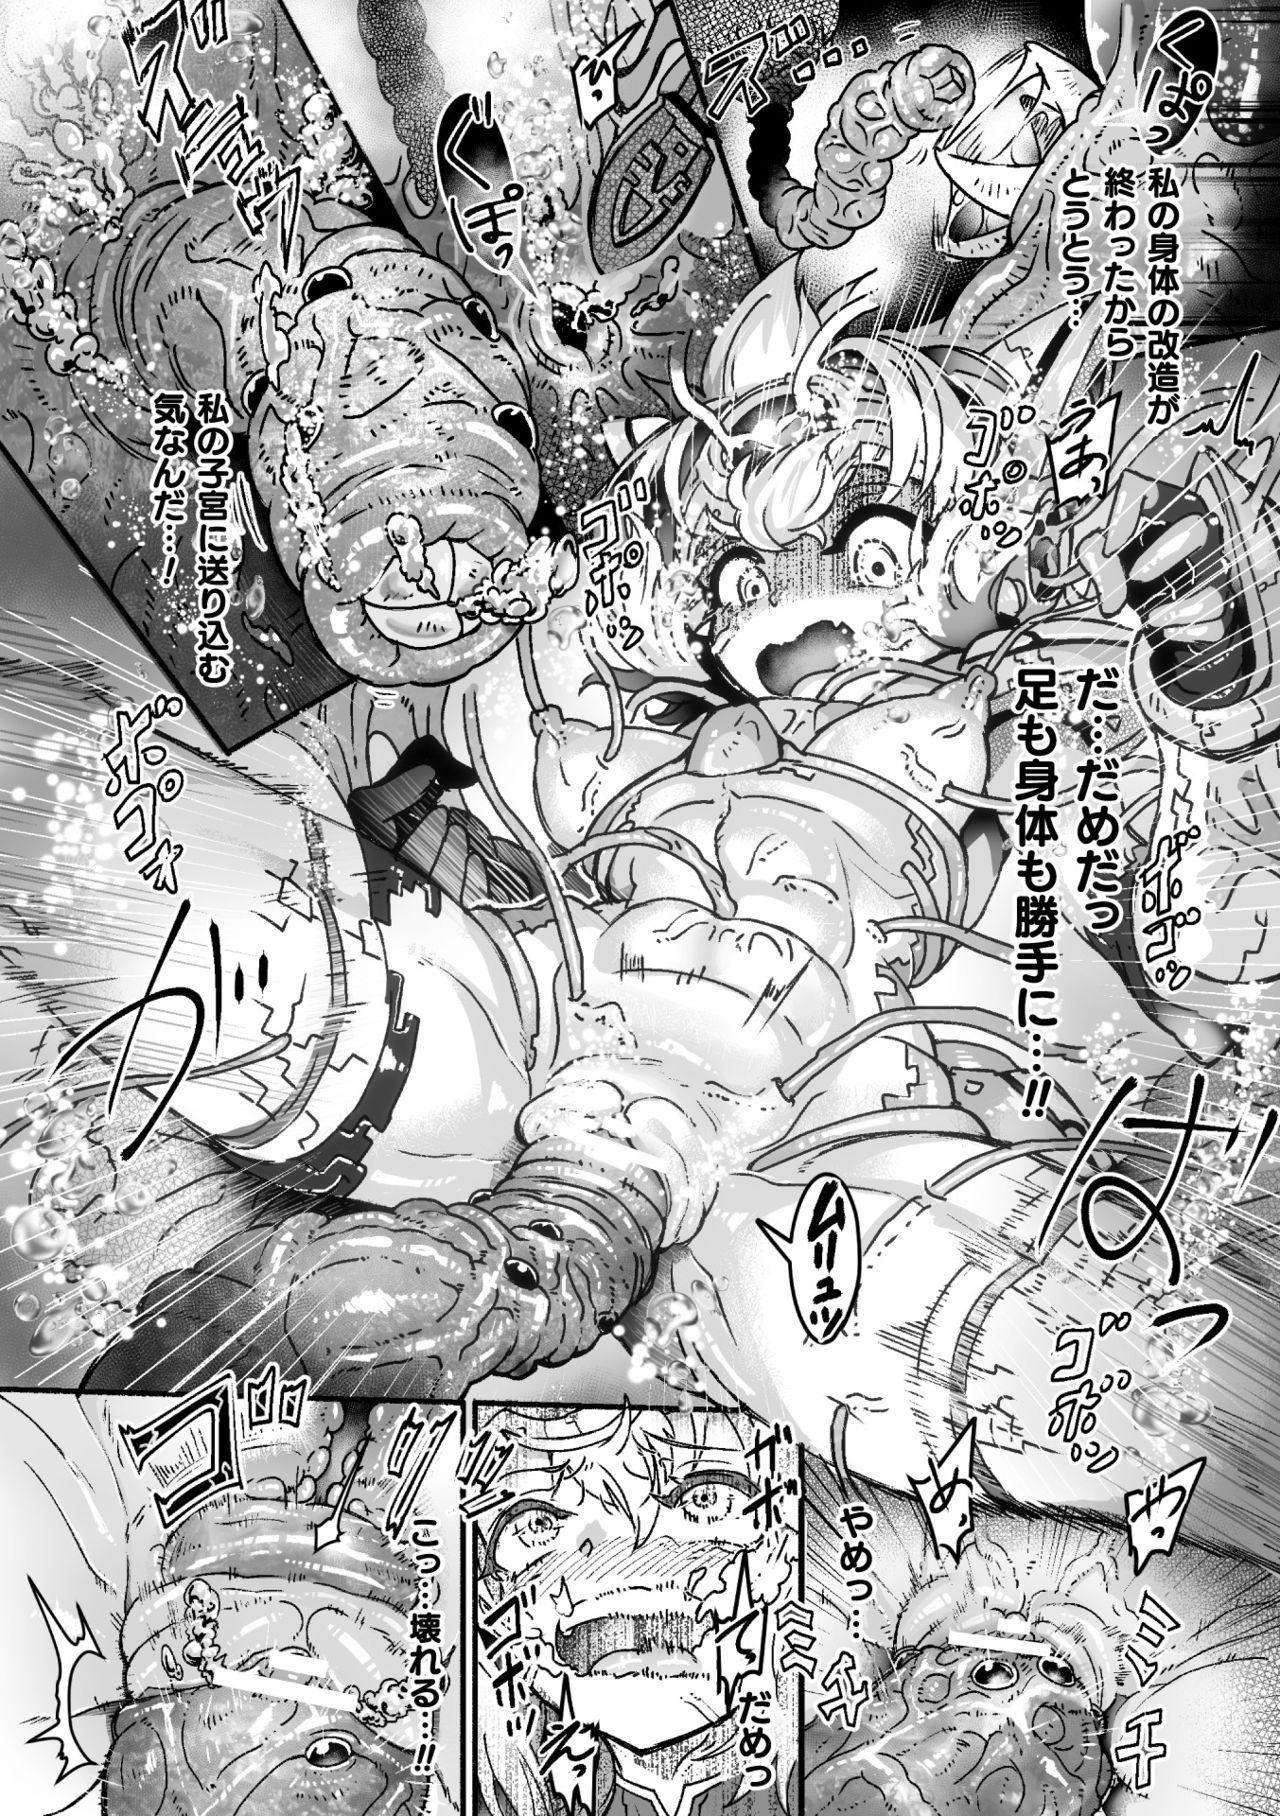 2D Comic Magazine Capsule Kan Seigi no Heroine Mesu Ochi Jikken! Vol. 2 39